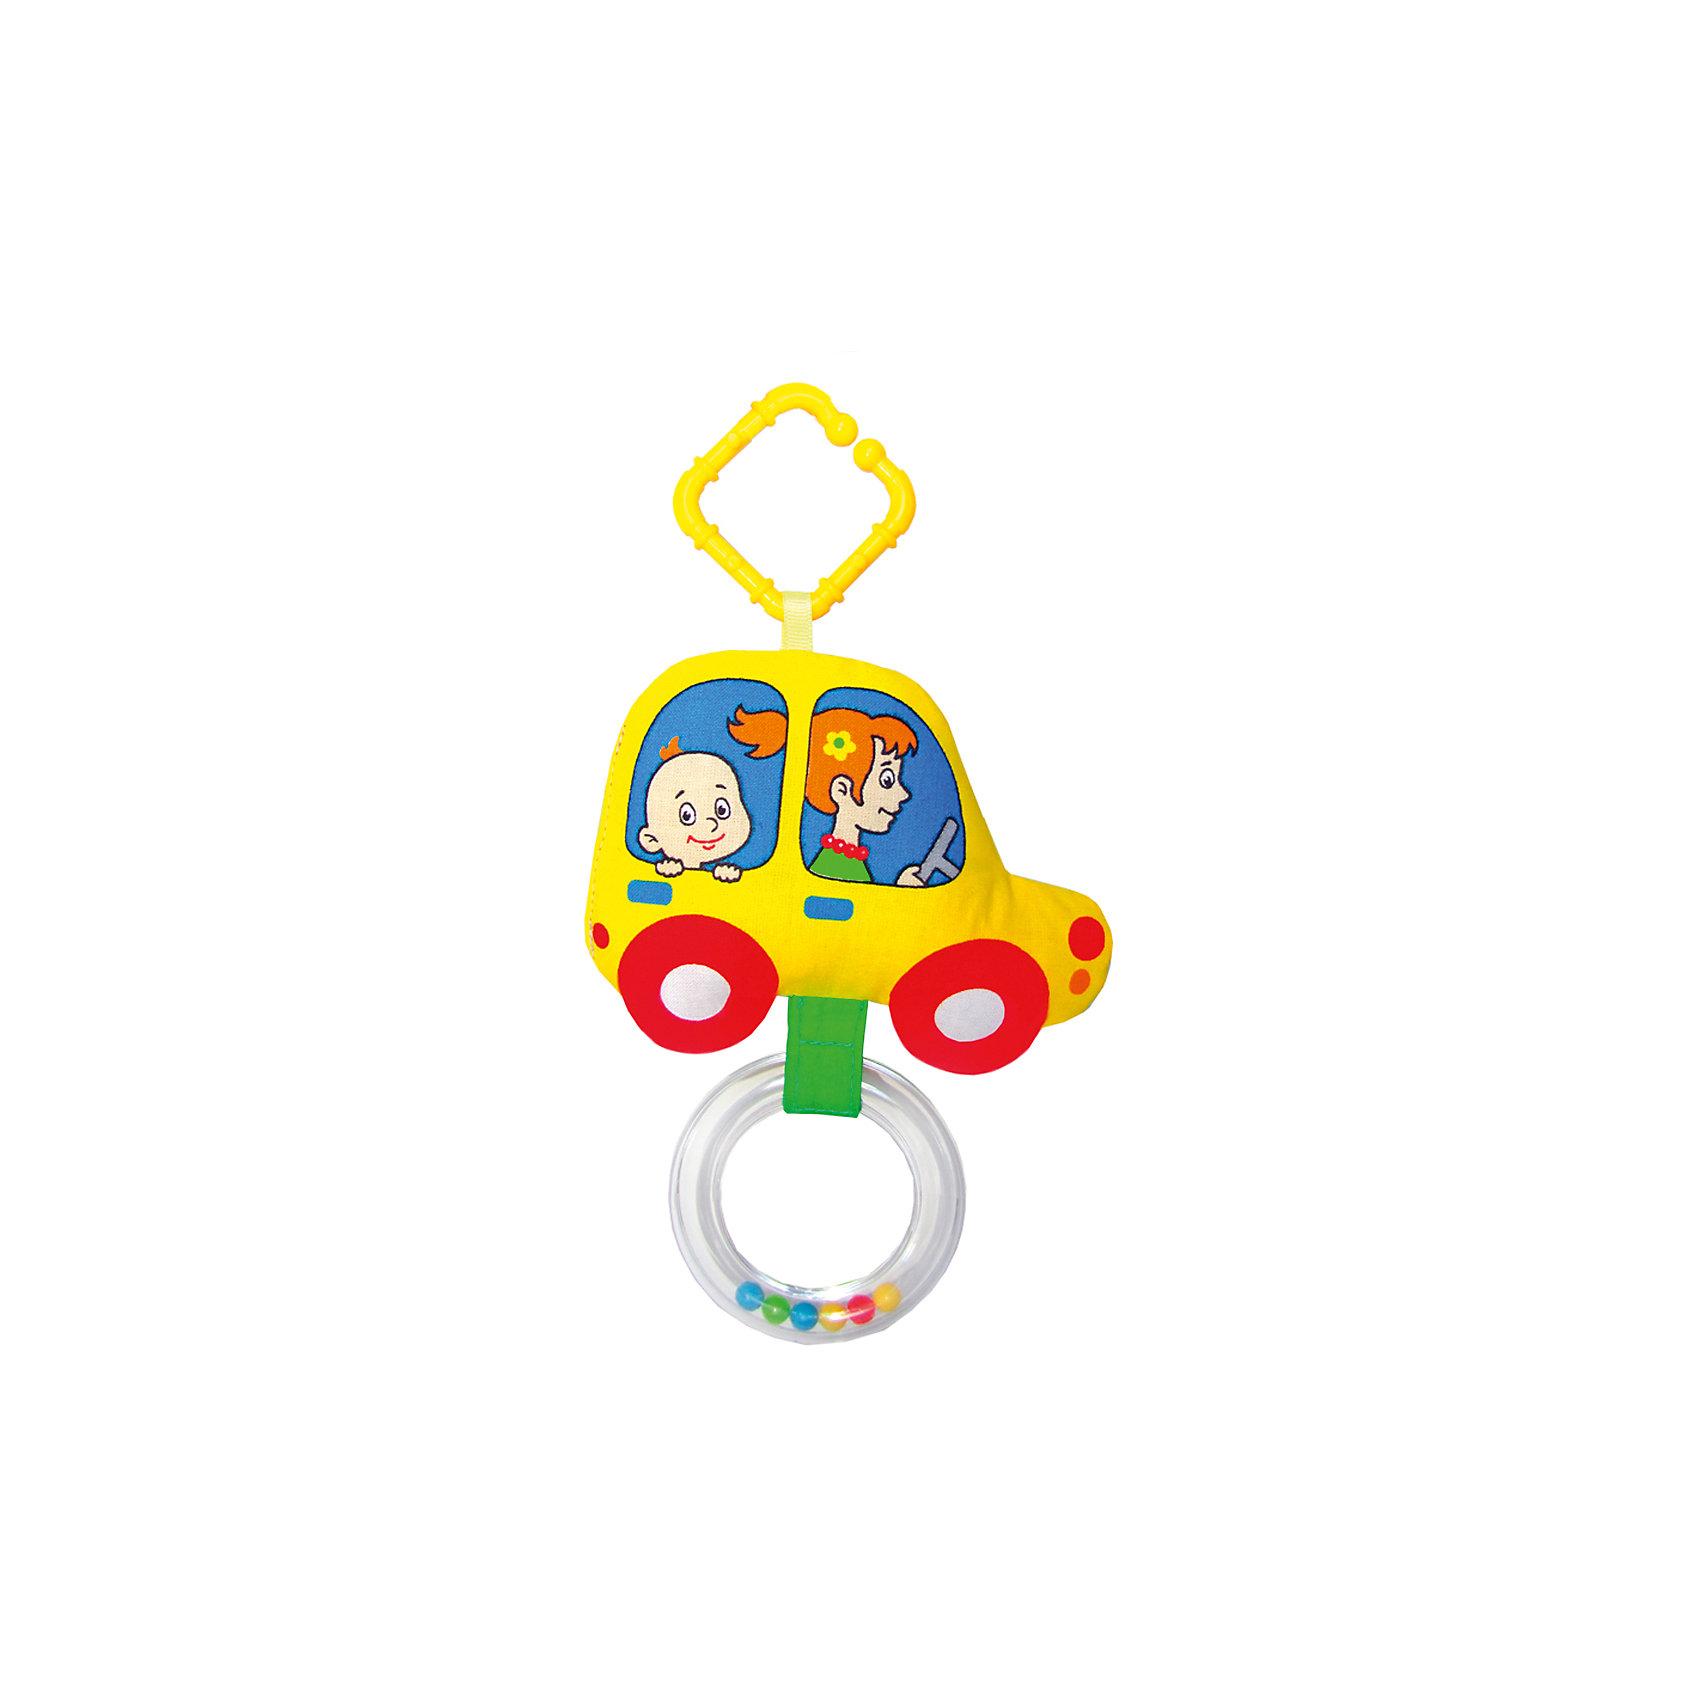 Мякиши Мягкая развивающая подвеска «Машинка», Мякиши игрушка погремушка мякиши медвежонок колечко